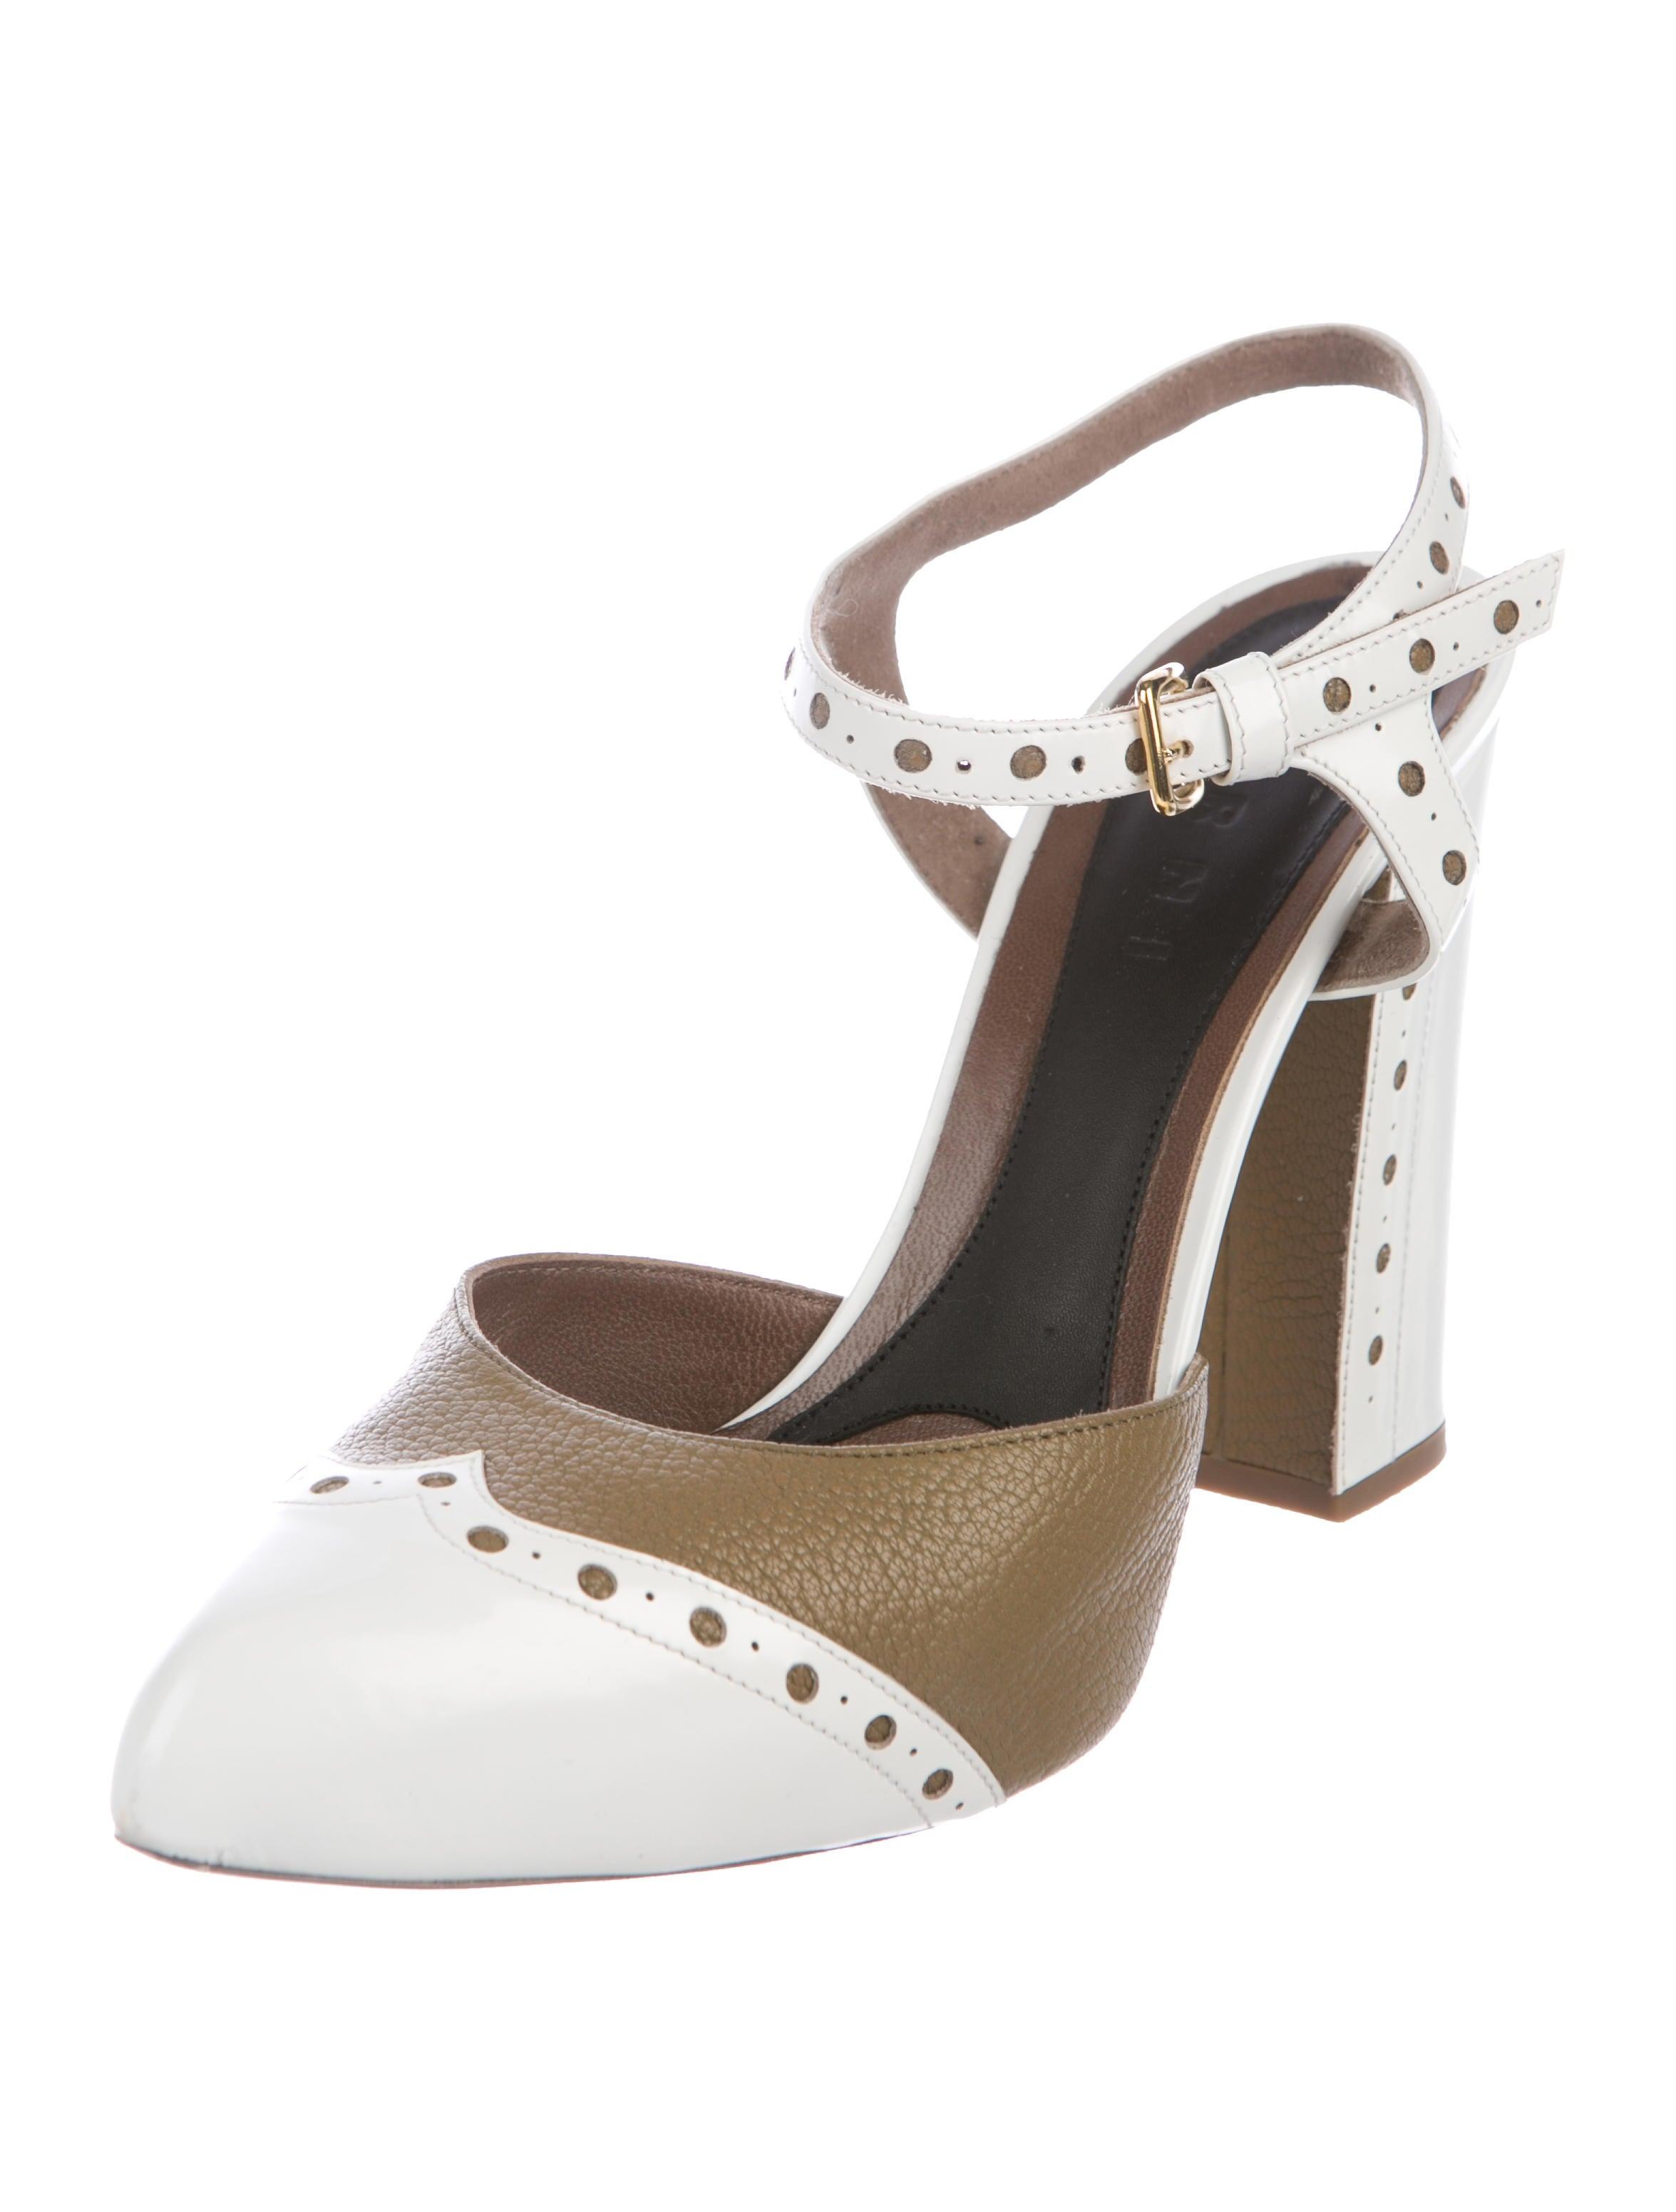 Marni Wingtip Ankle-Strap Pumps footlocker 2015 cheap online cheap latest collections 8E2g7J